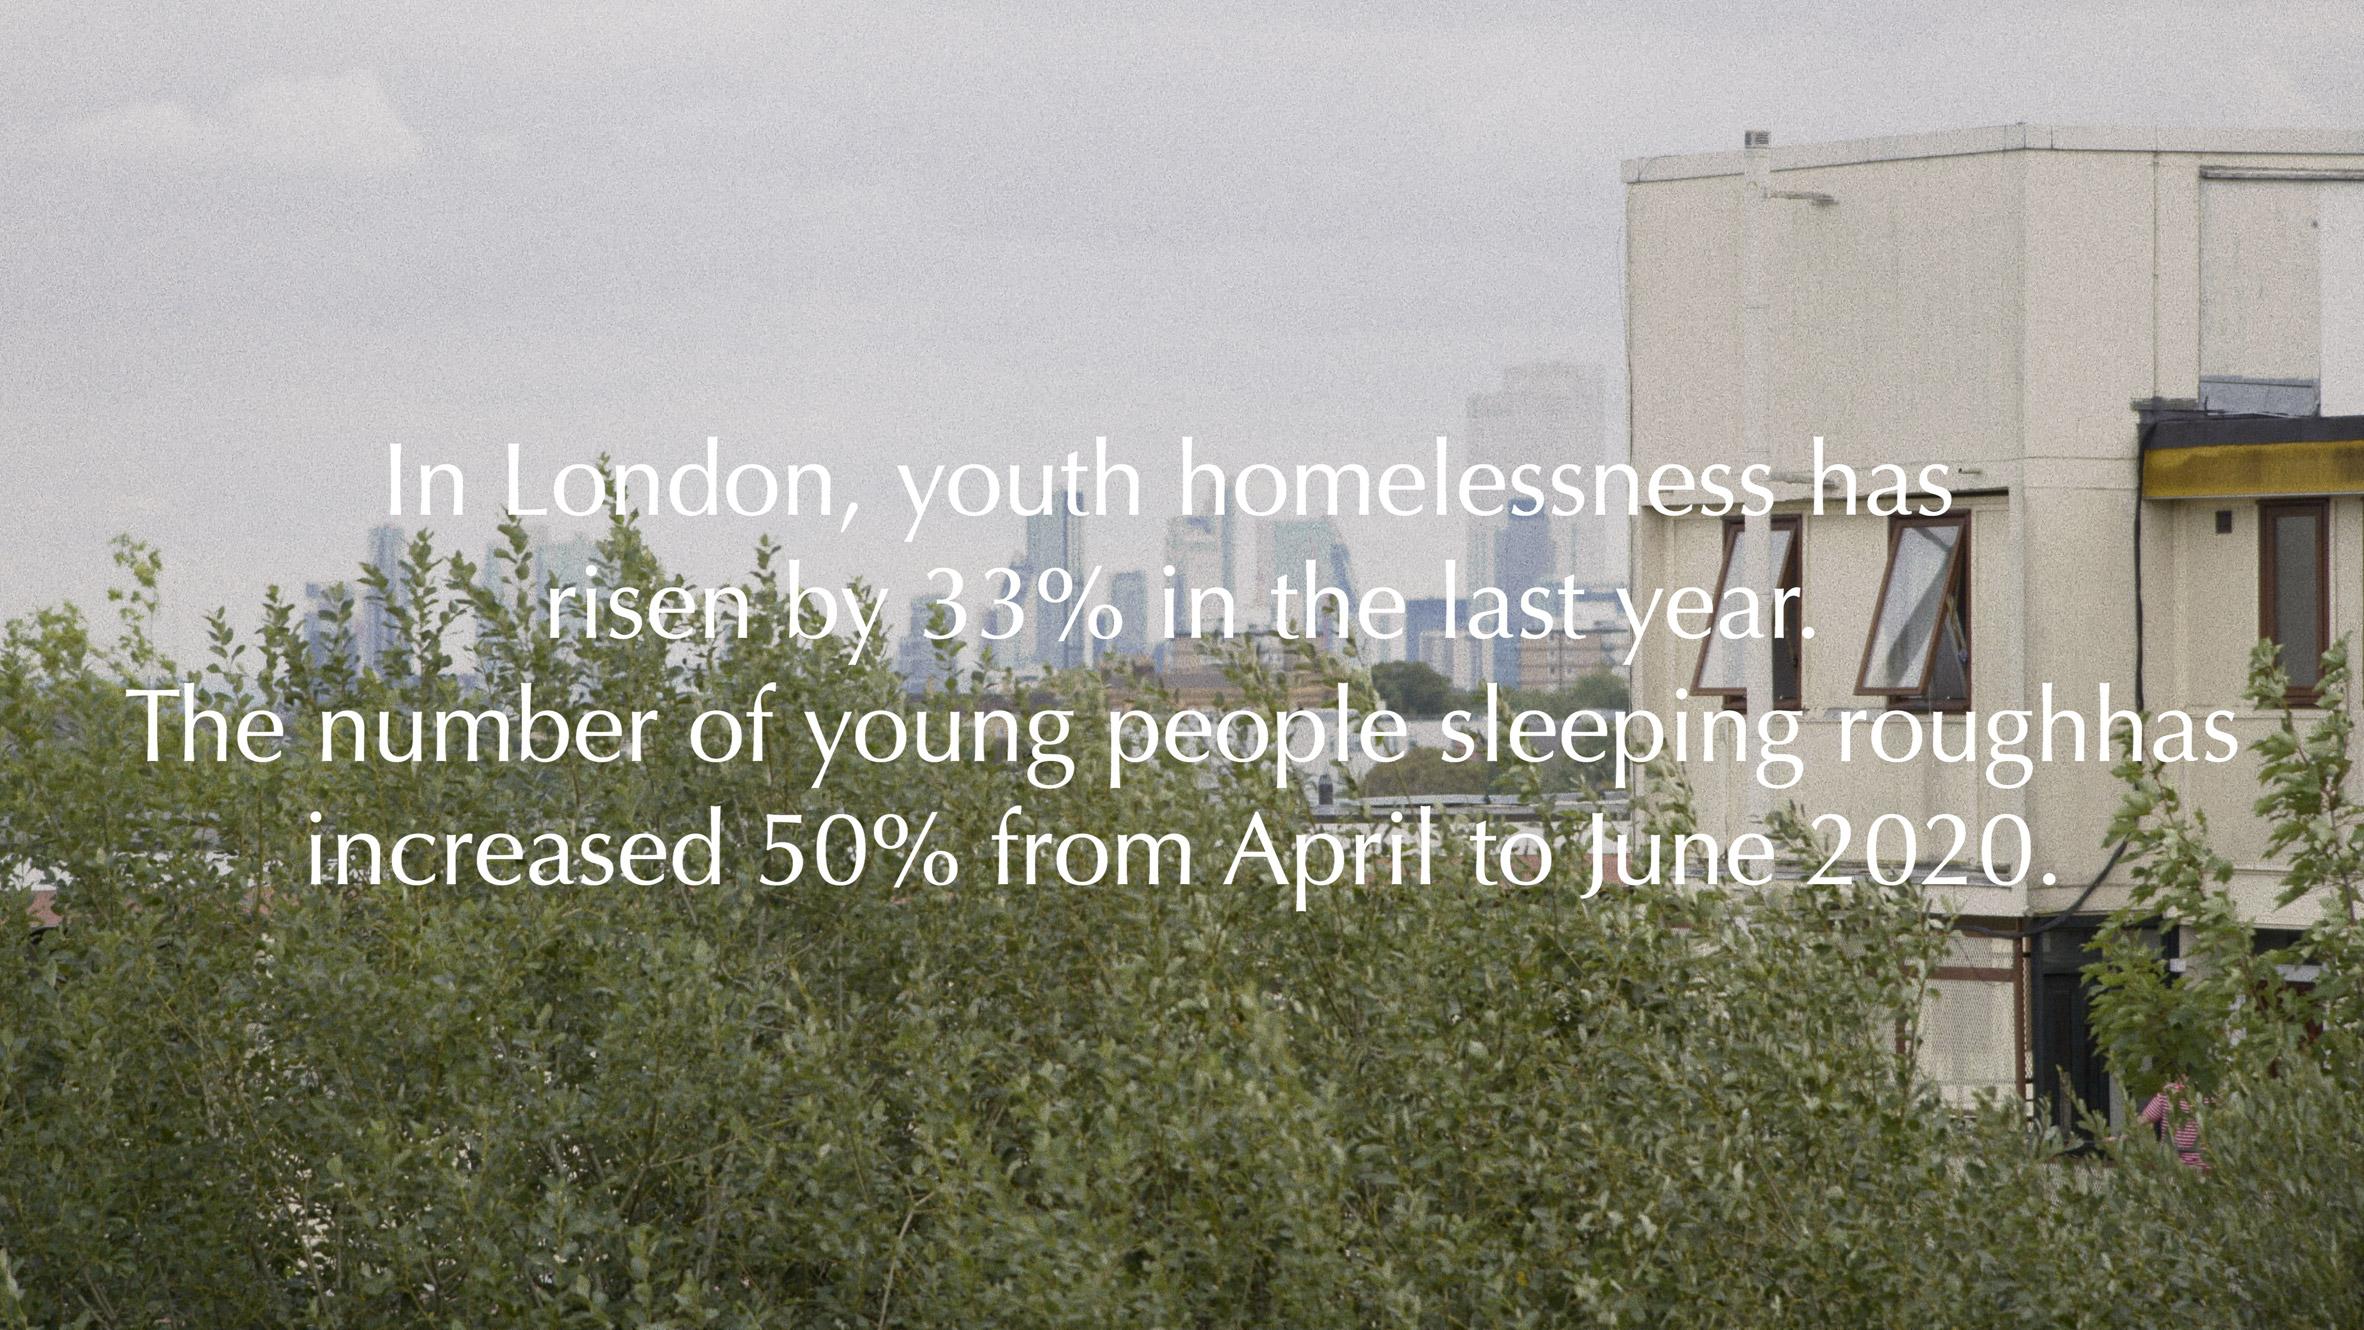 Homeless housing regulation video